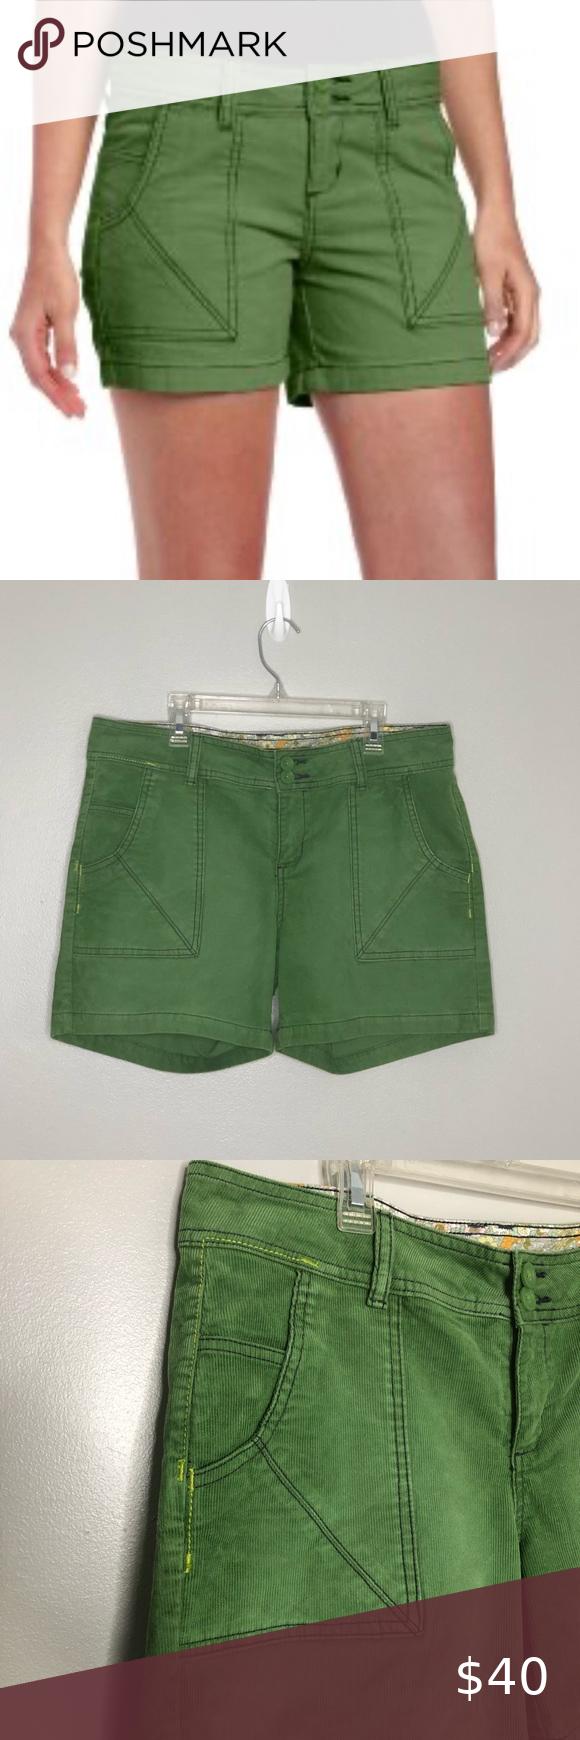 PraNa Suki green corduroy shorts, size 10